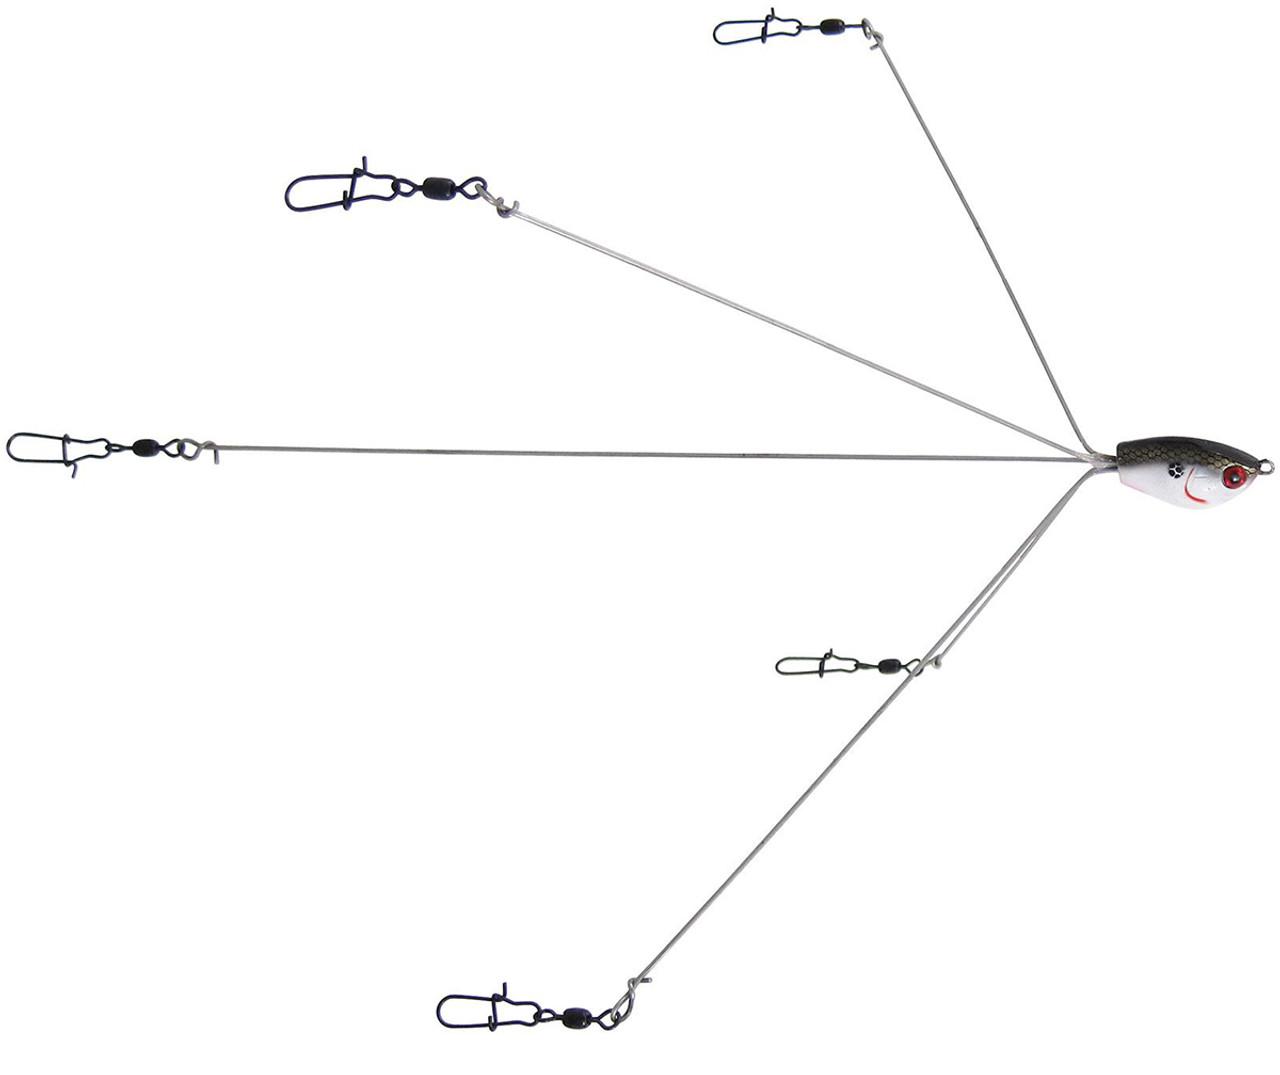 YUM Baits Ultralight Yumbrella Fishing Lure